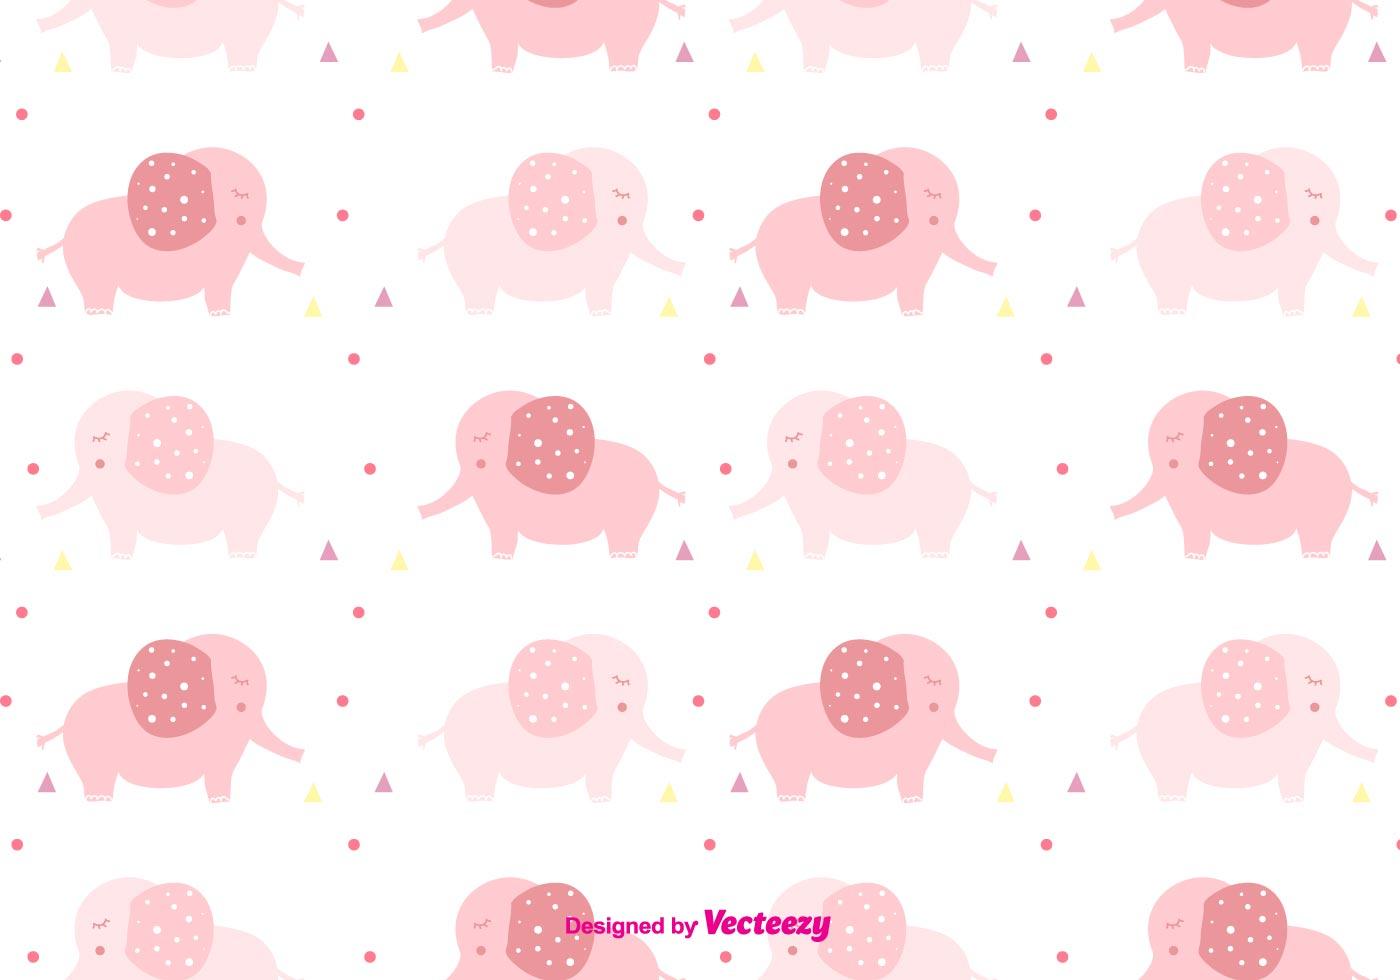 Baby Girl Nursery Wallpaper Borders Girly Baby Elephant Pattern Download Free Vector Art